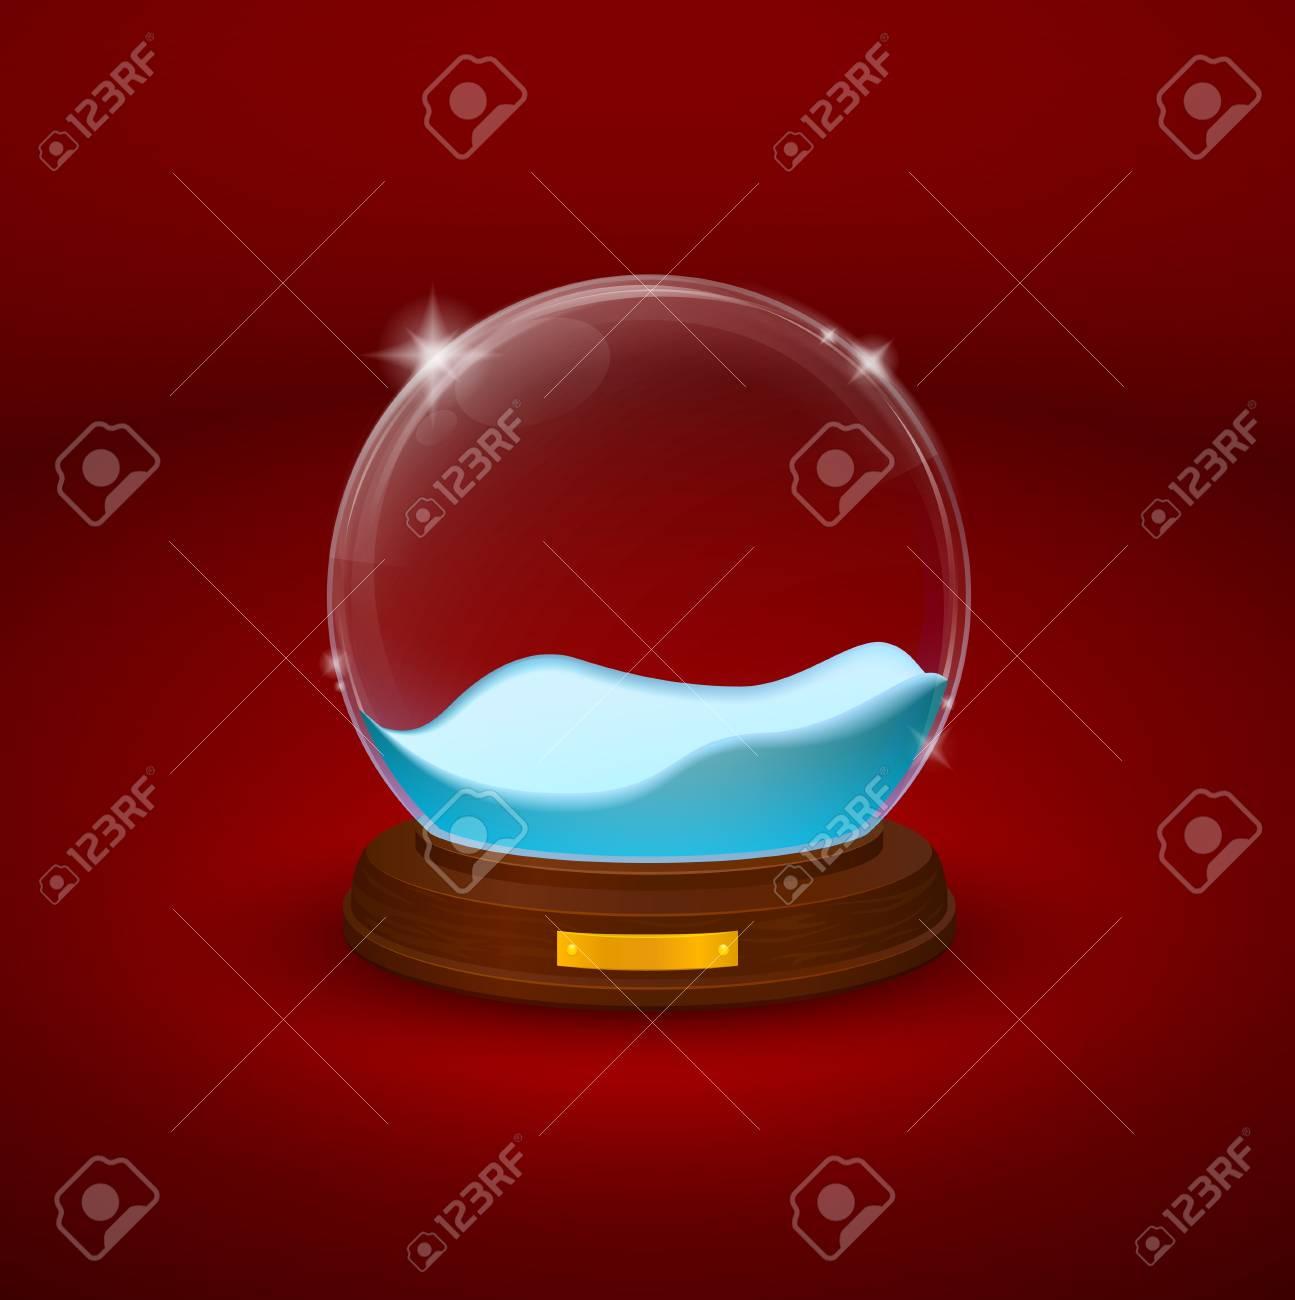 snow-dome or crystal ball Stock Vector - 16925827